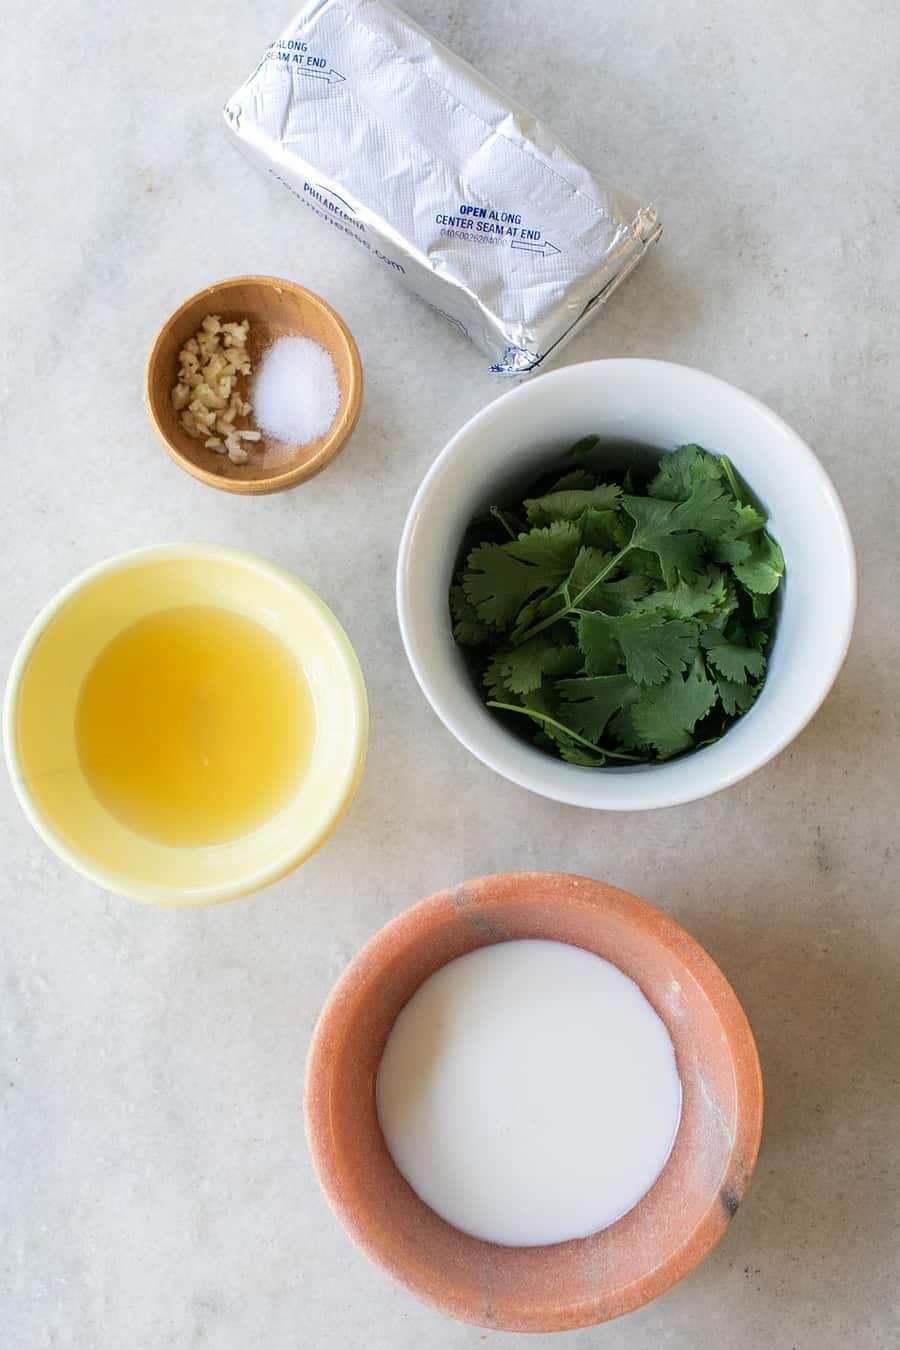 Cilantro, milk, cream cheese, lemon juice, salt and garlic